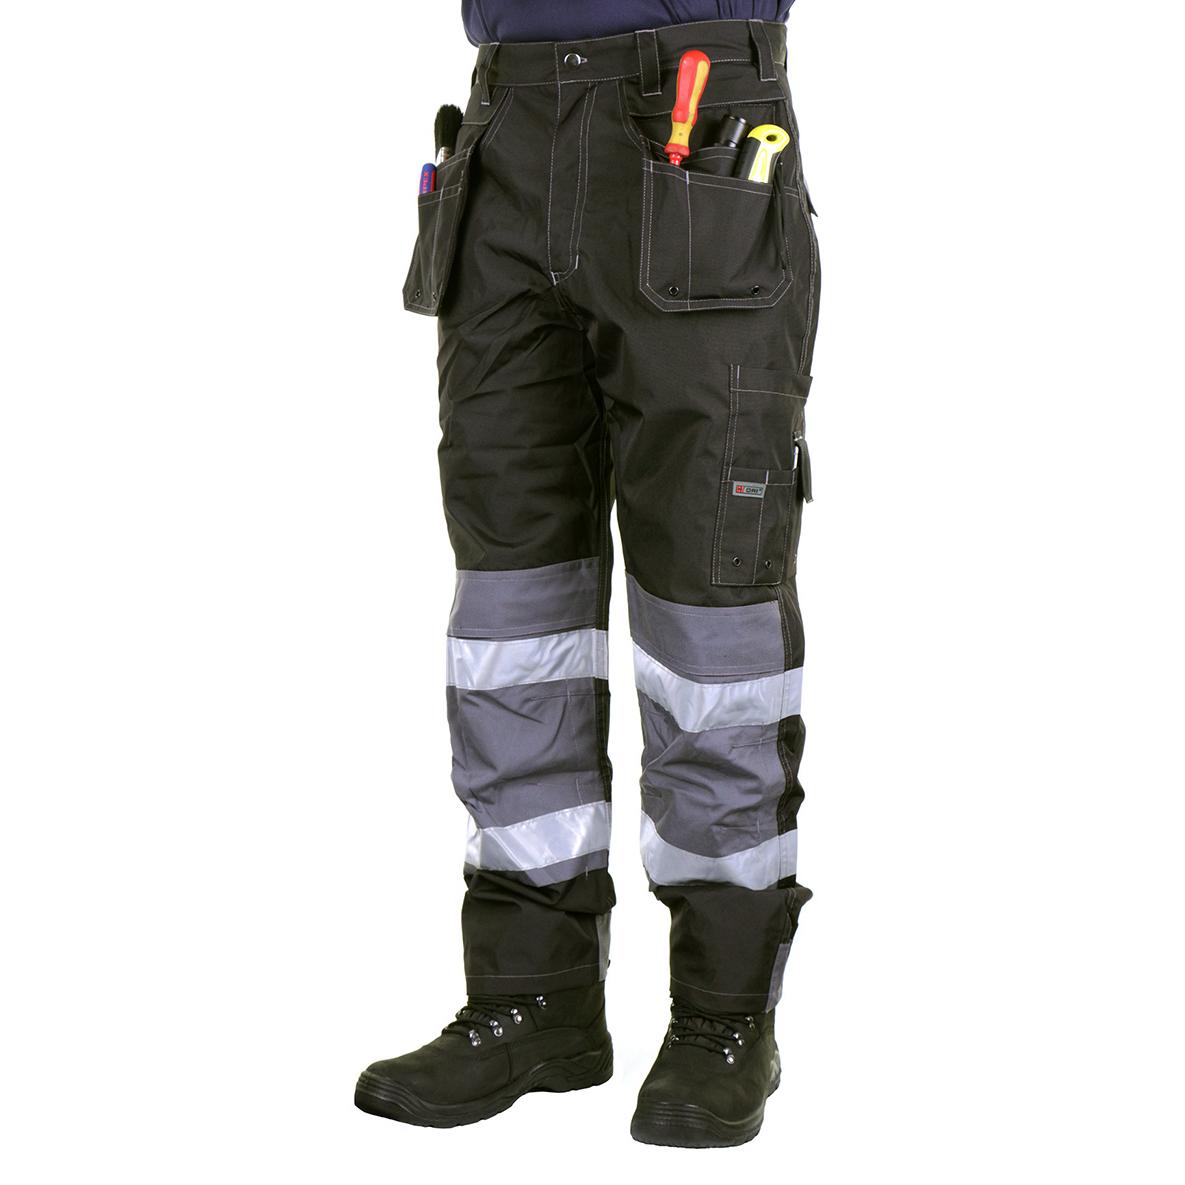 B-Dri Weatherproof Banbury Multi Pocket Trousers Black 32*Up to 3 Day Leadtime*